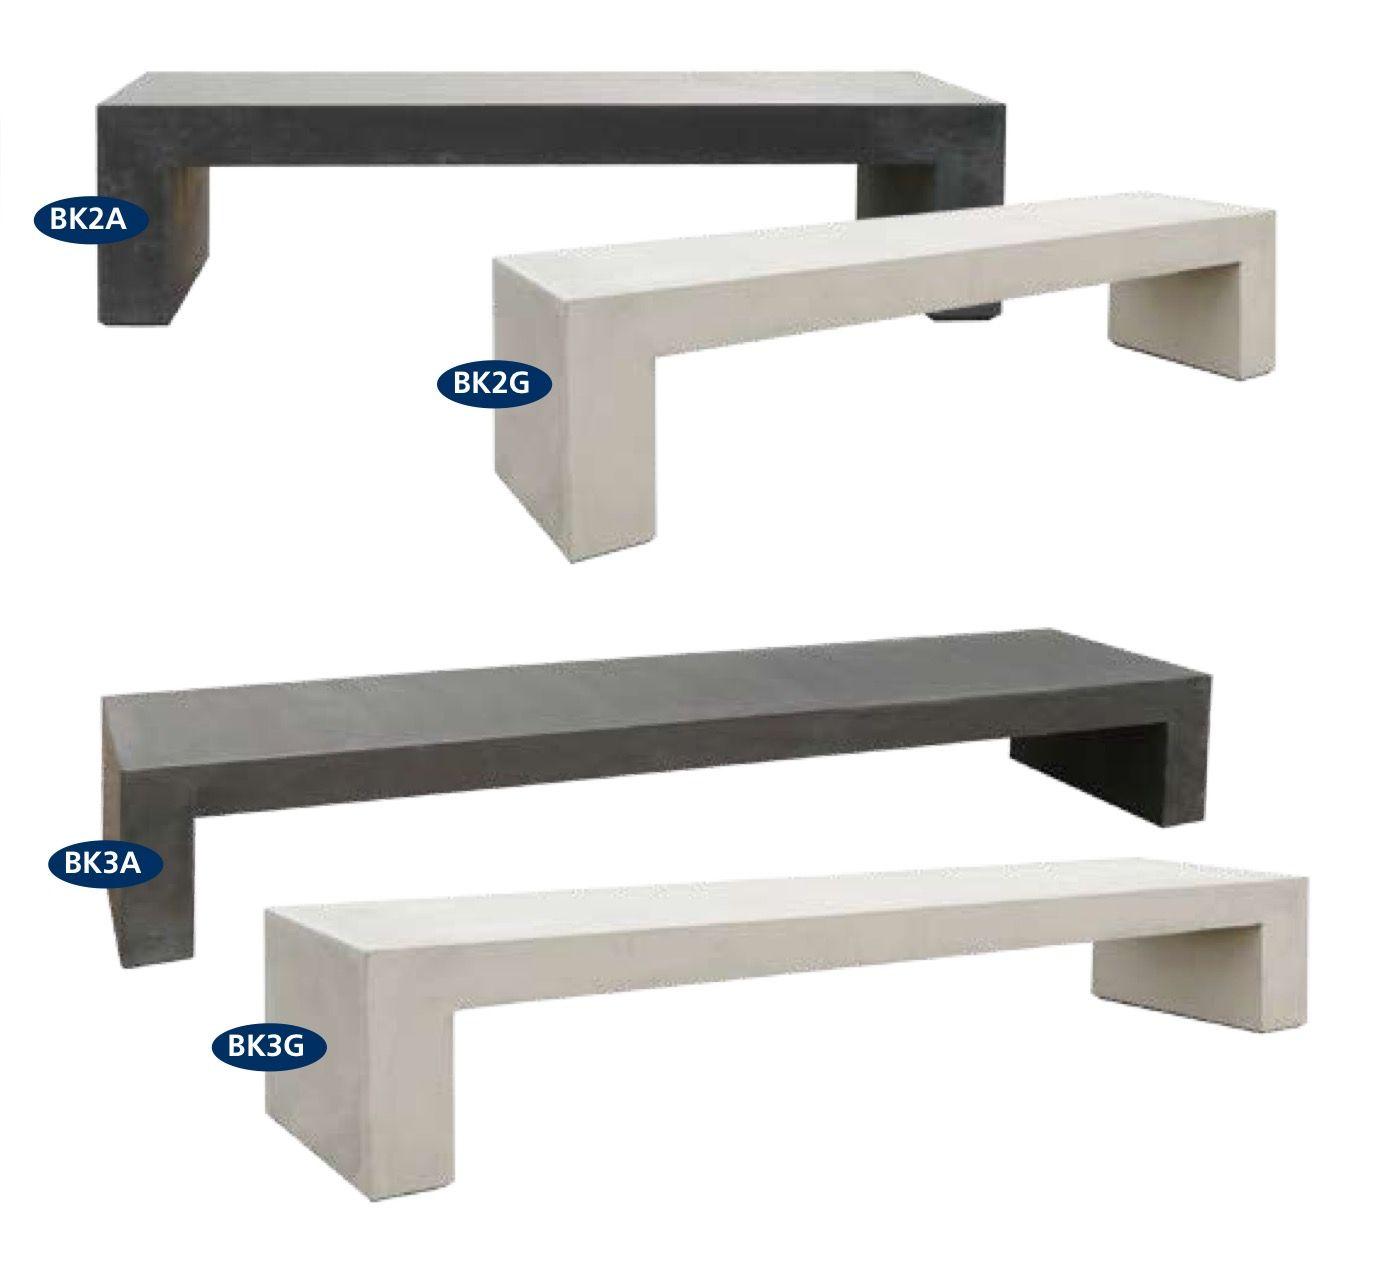 bank onder houtkachel - 180x45x45 cm / 300x80x45 cm - bs beton (http